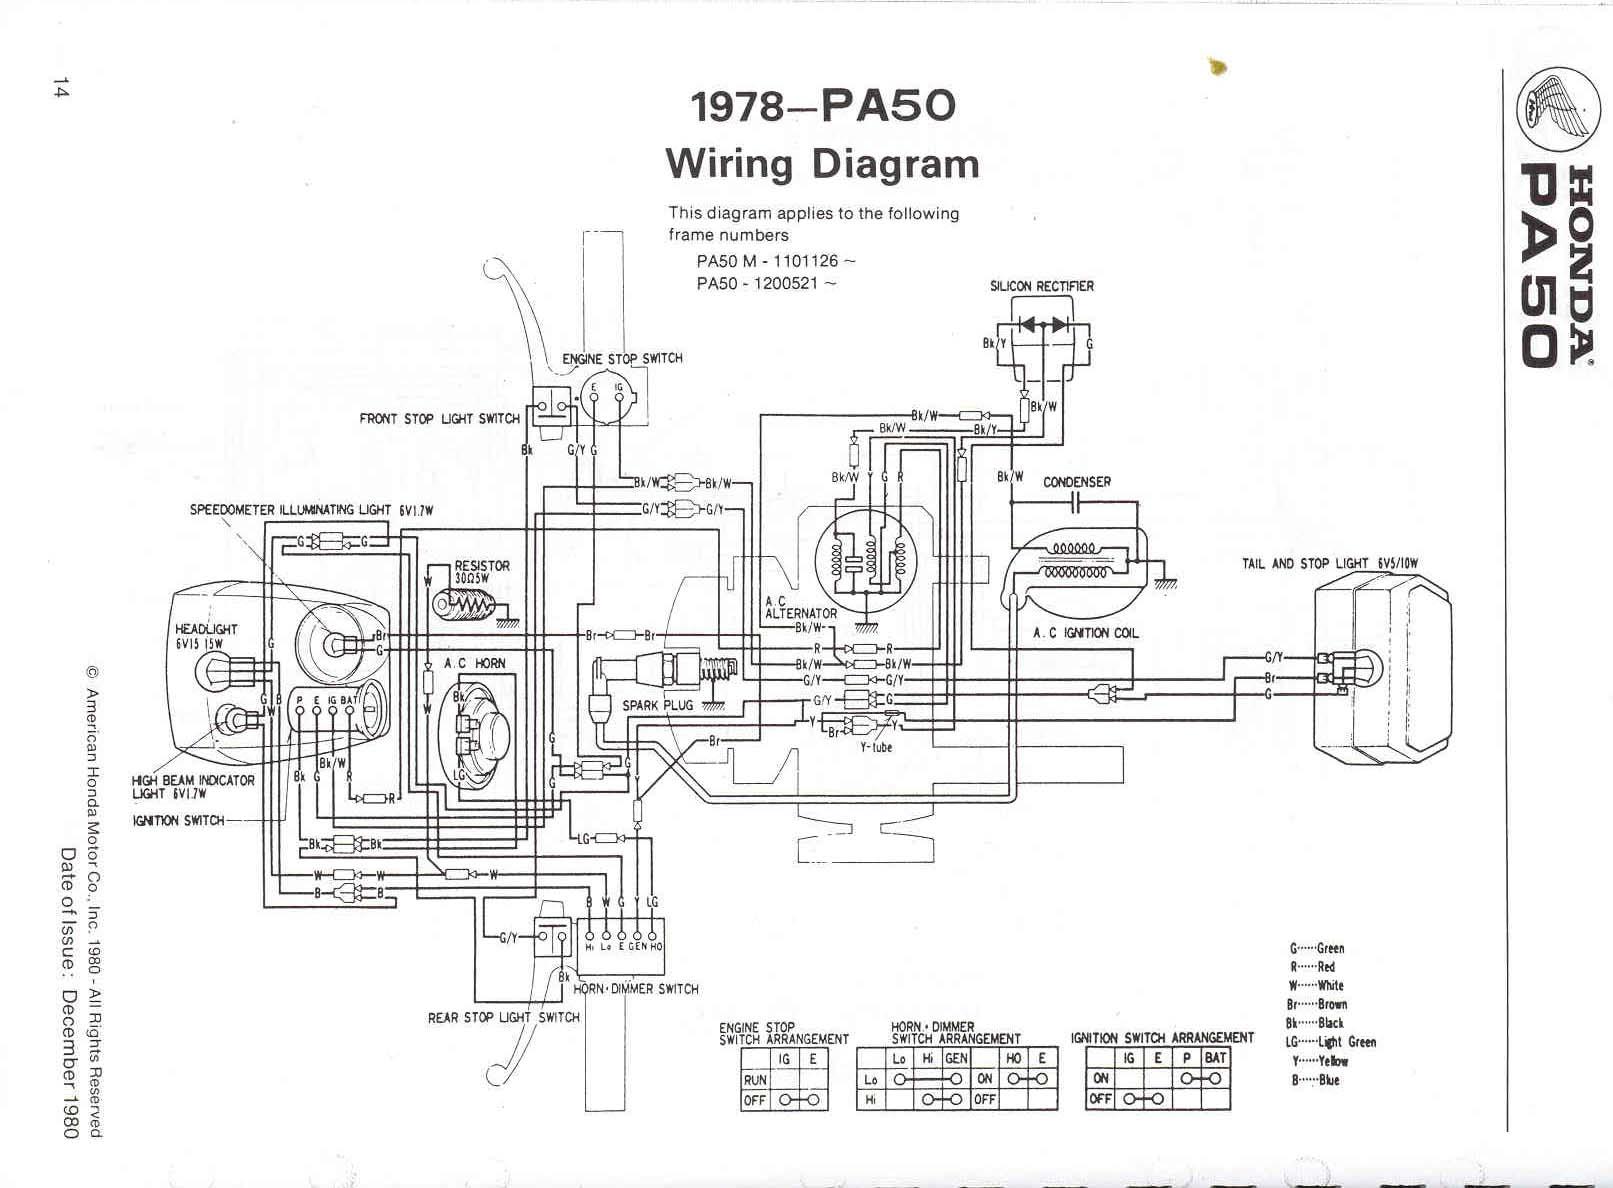 Re Wiring Diagram Honda Pa 50